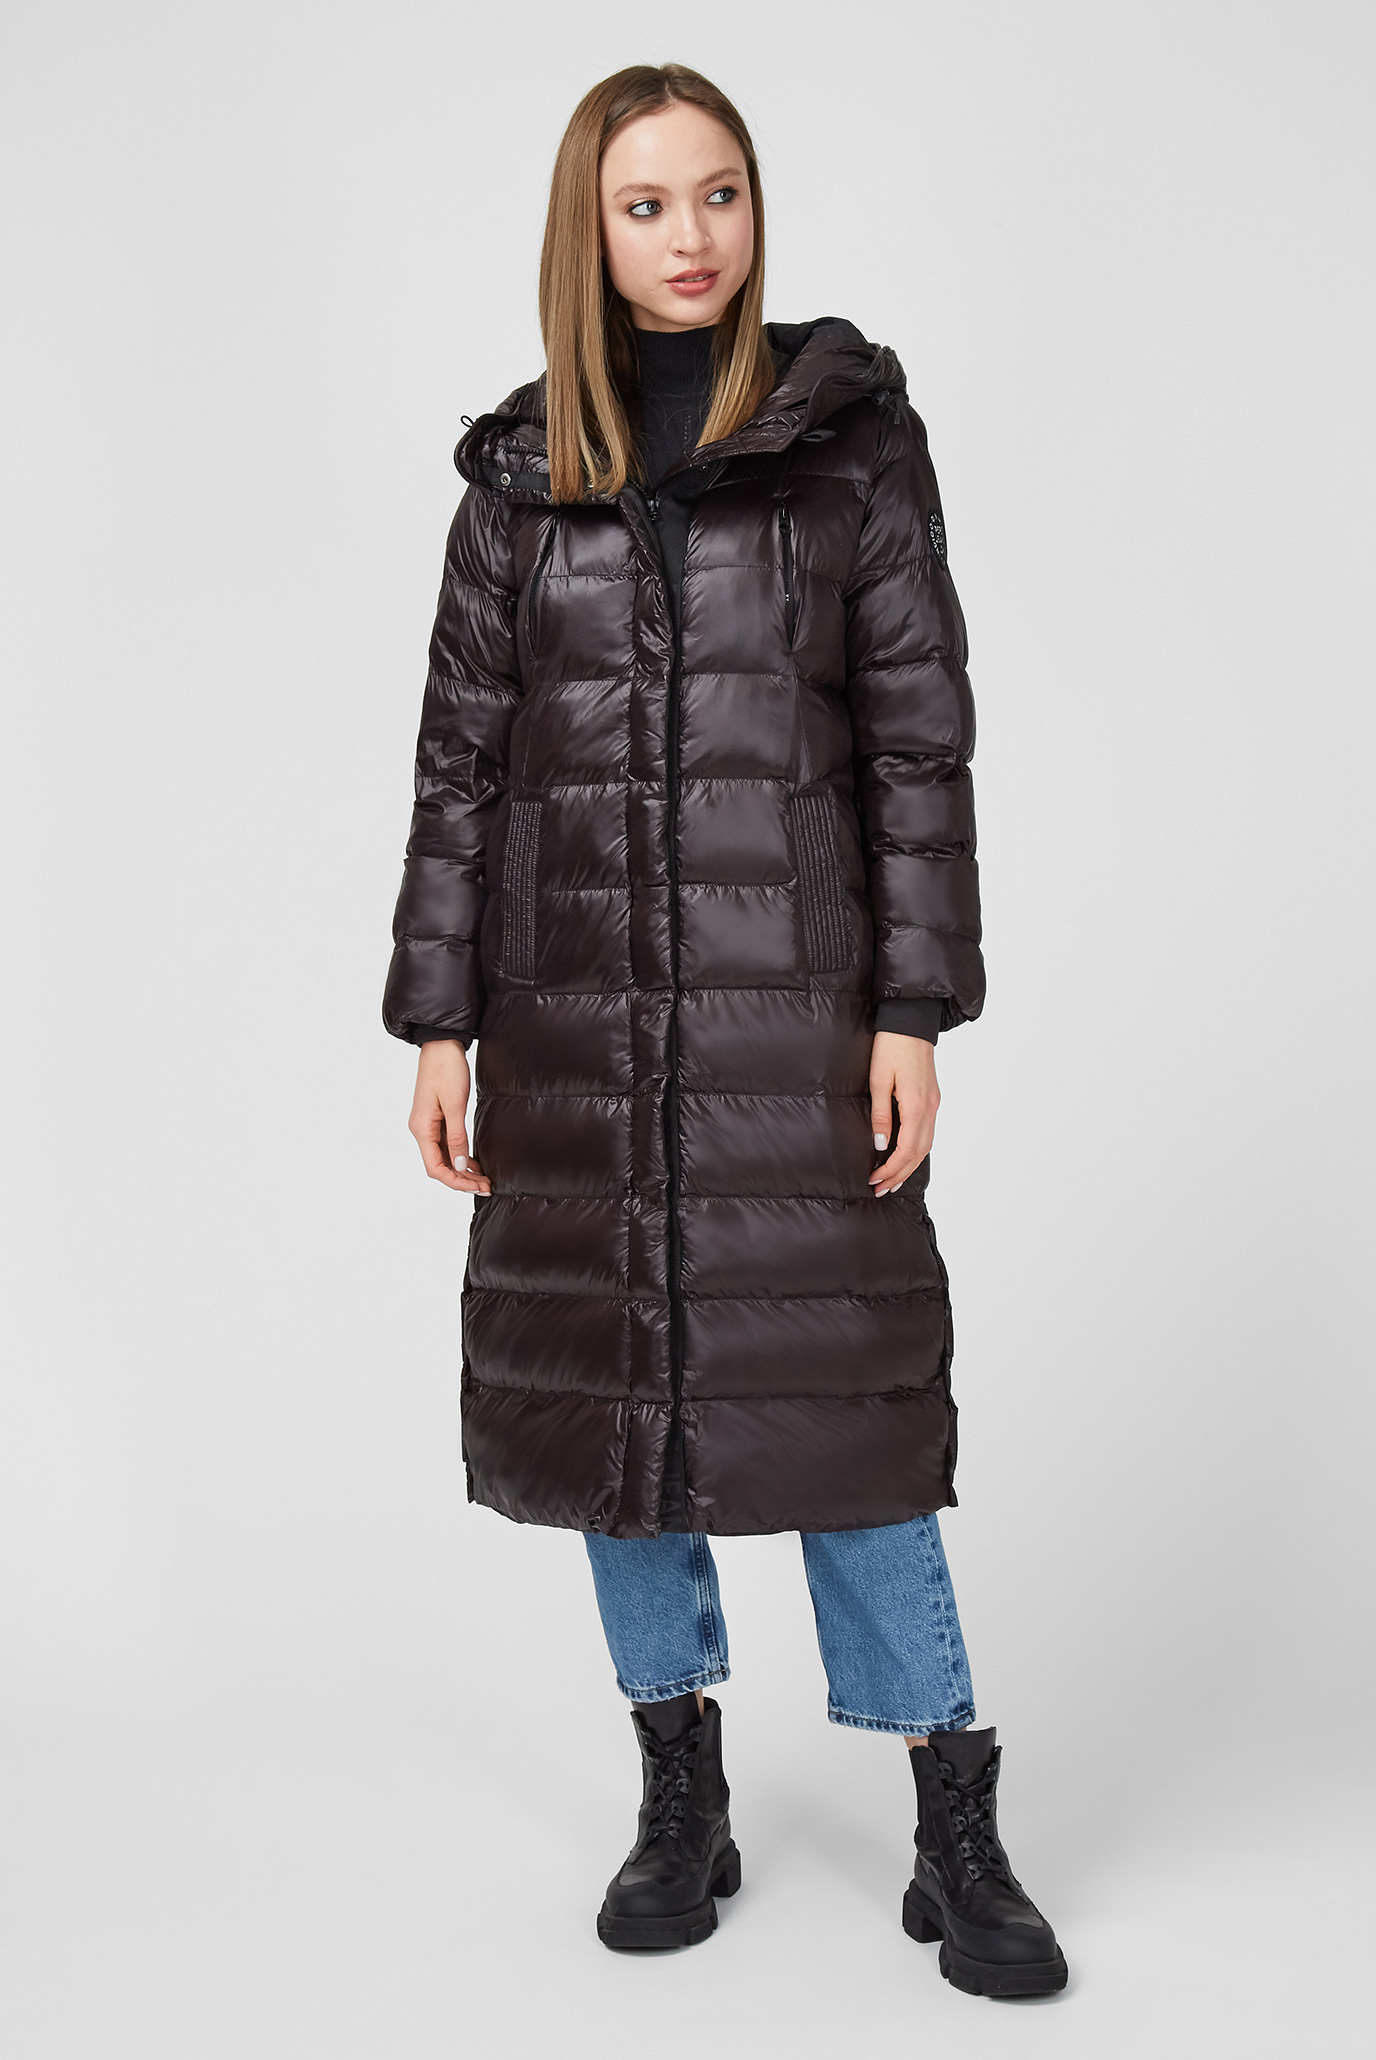 Жіноча чорна куртка LIZZY 1